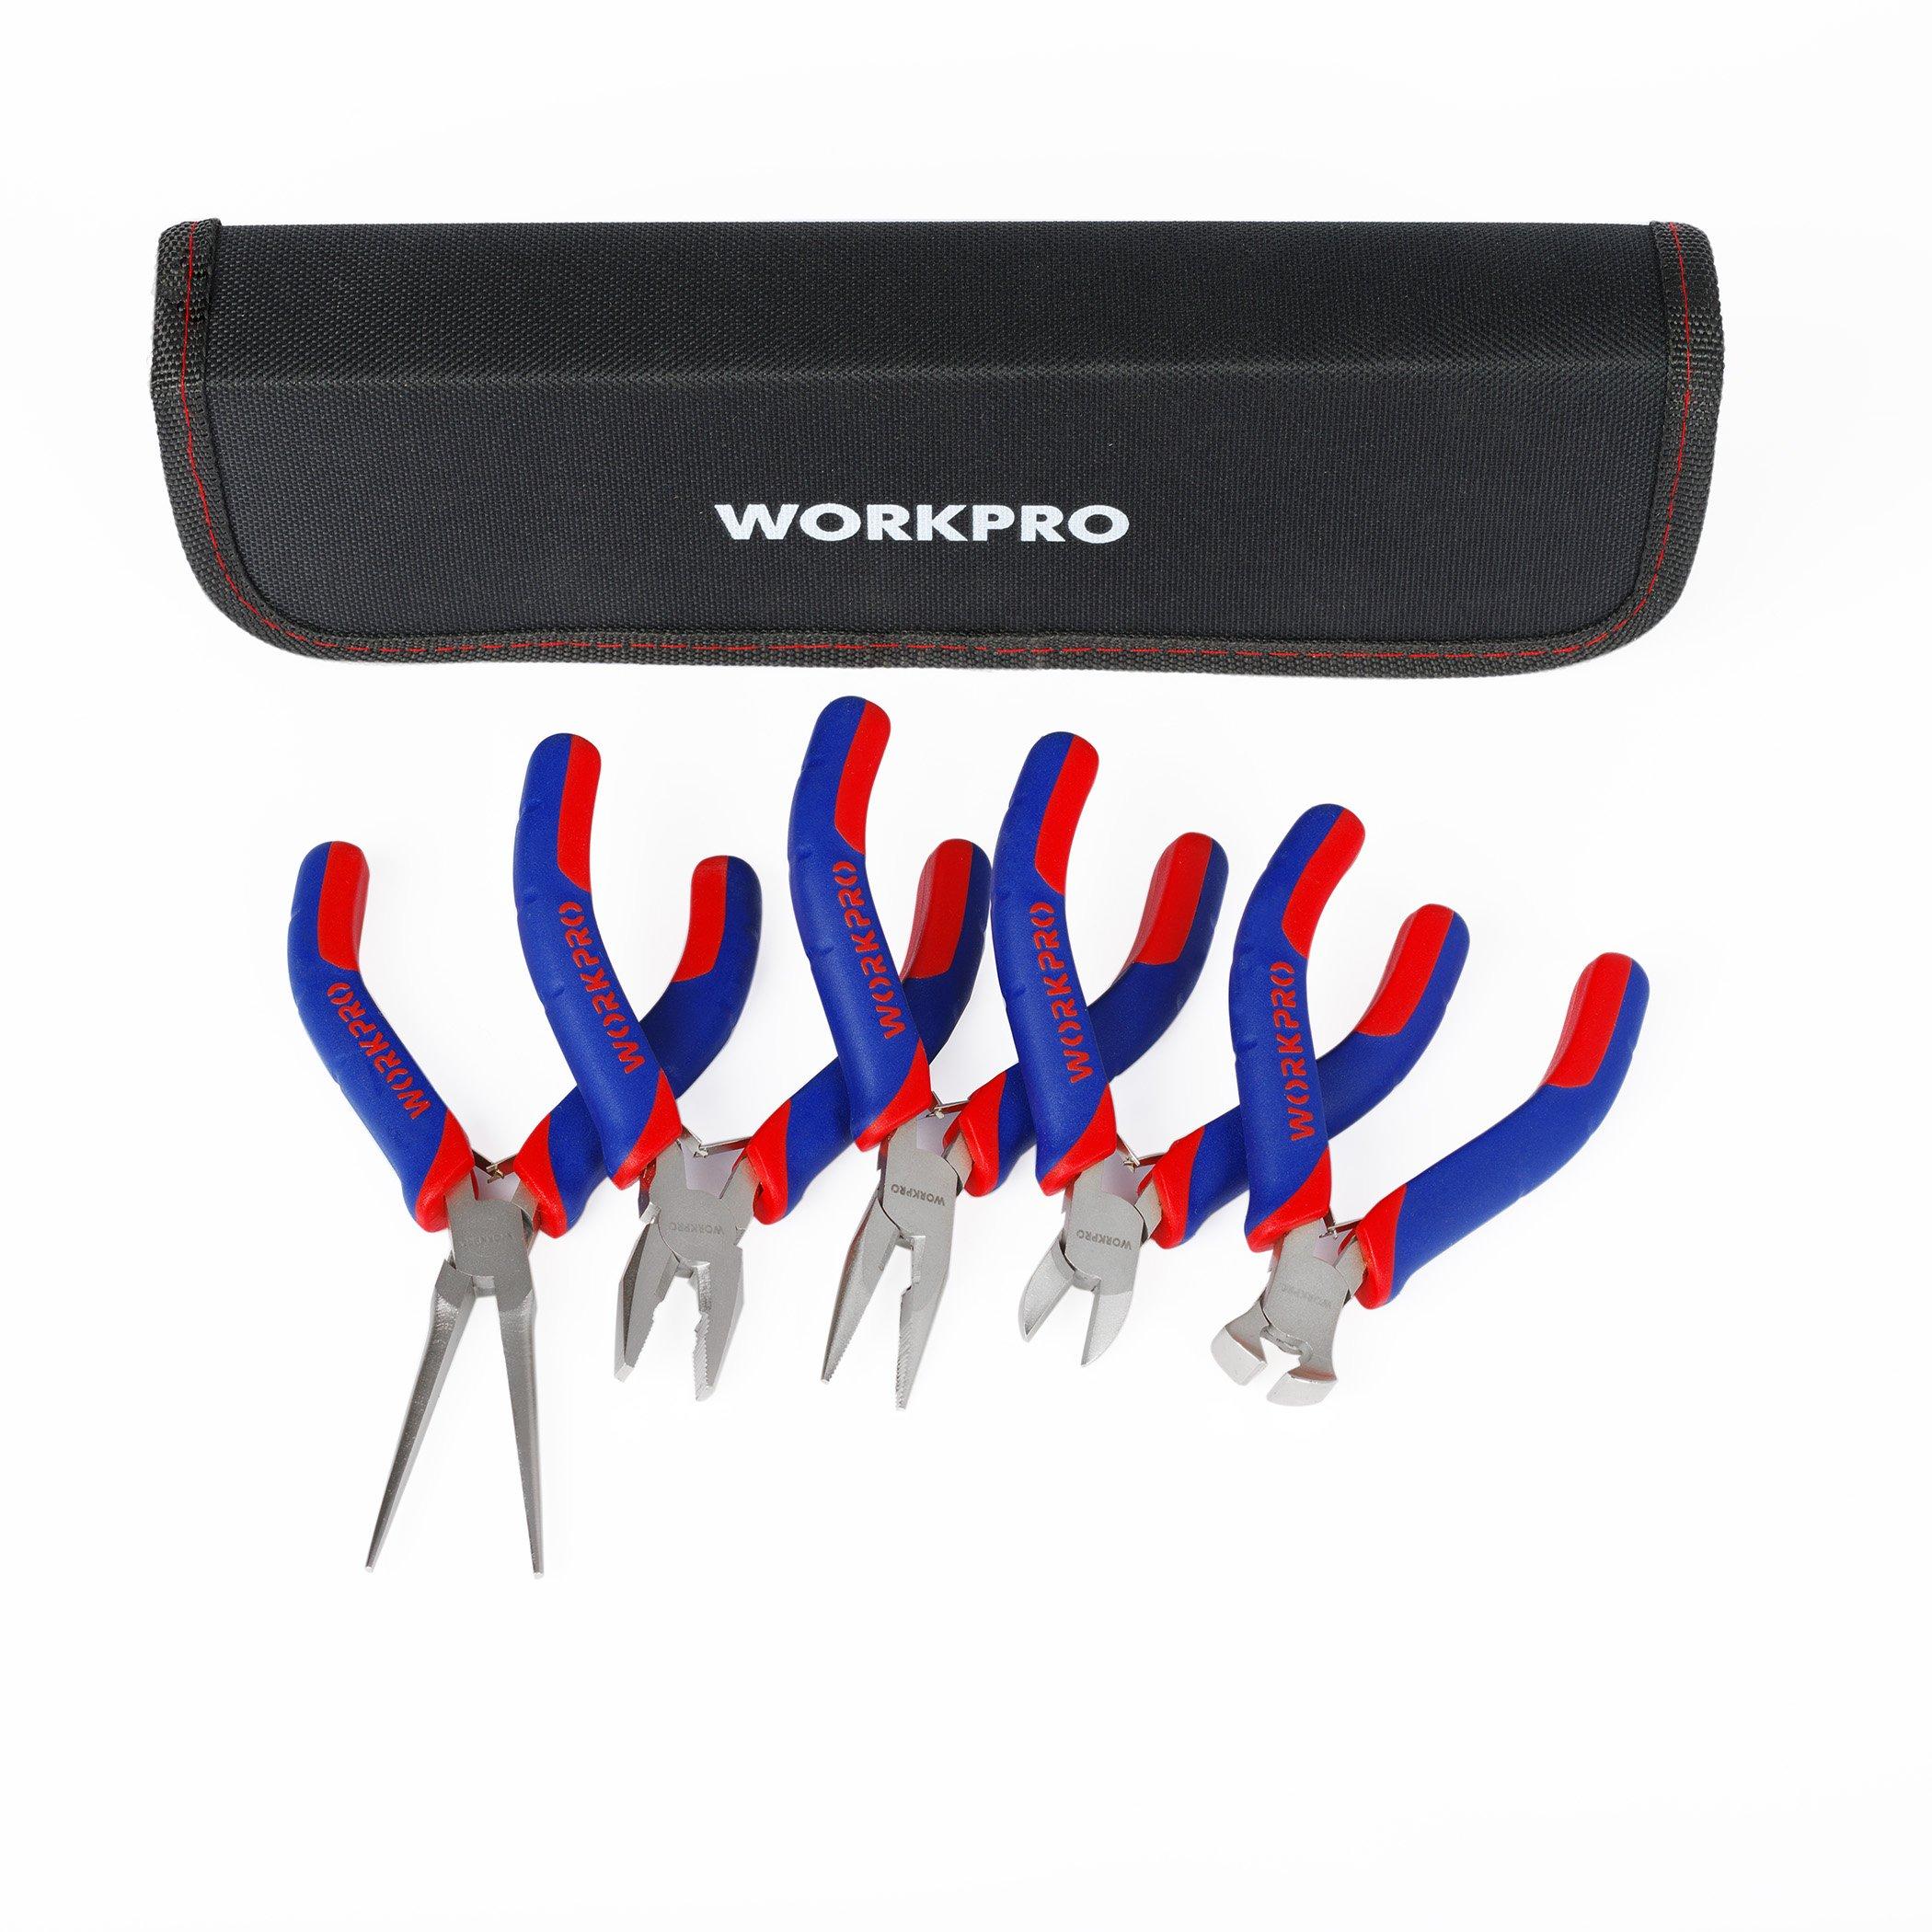 WORKPRO 5-Piece MINI Precision Pliers set